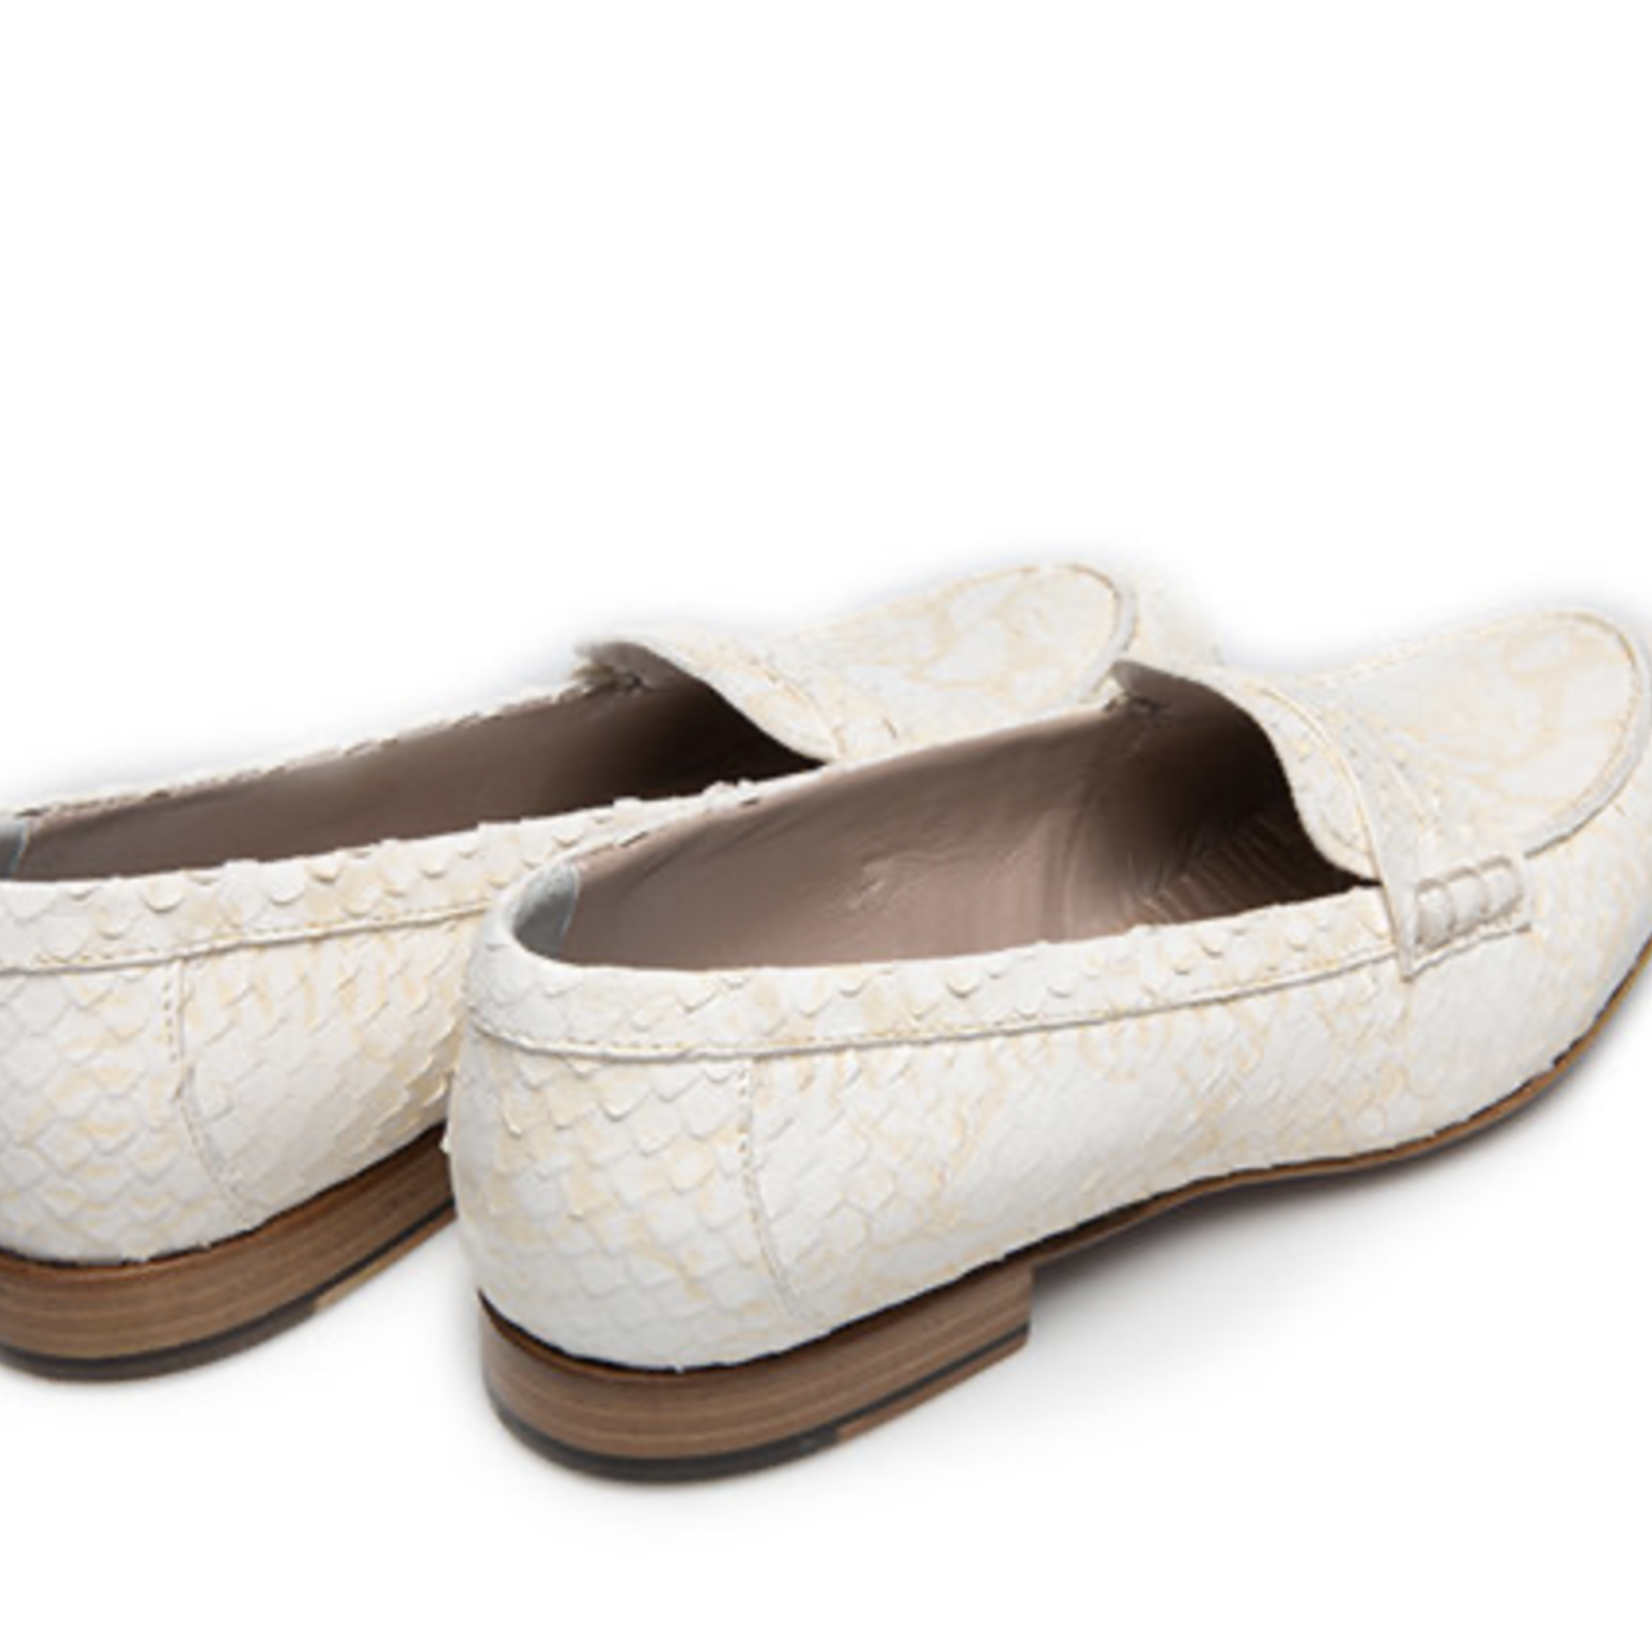 Corvari Covari loafer